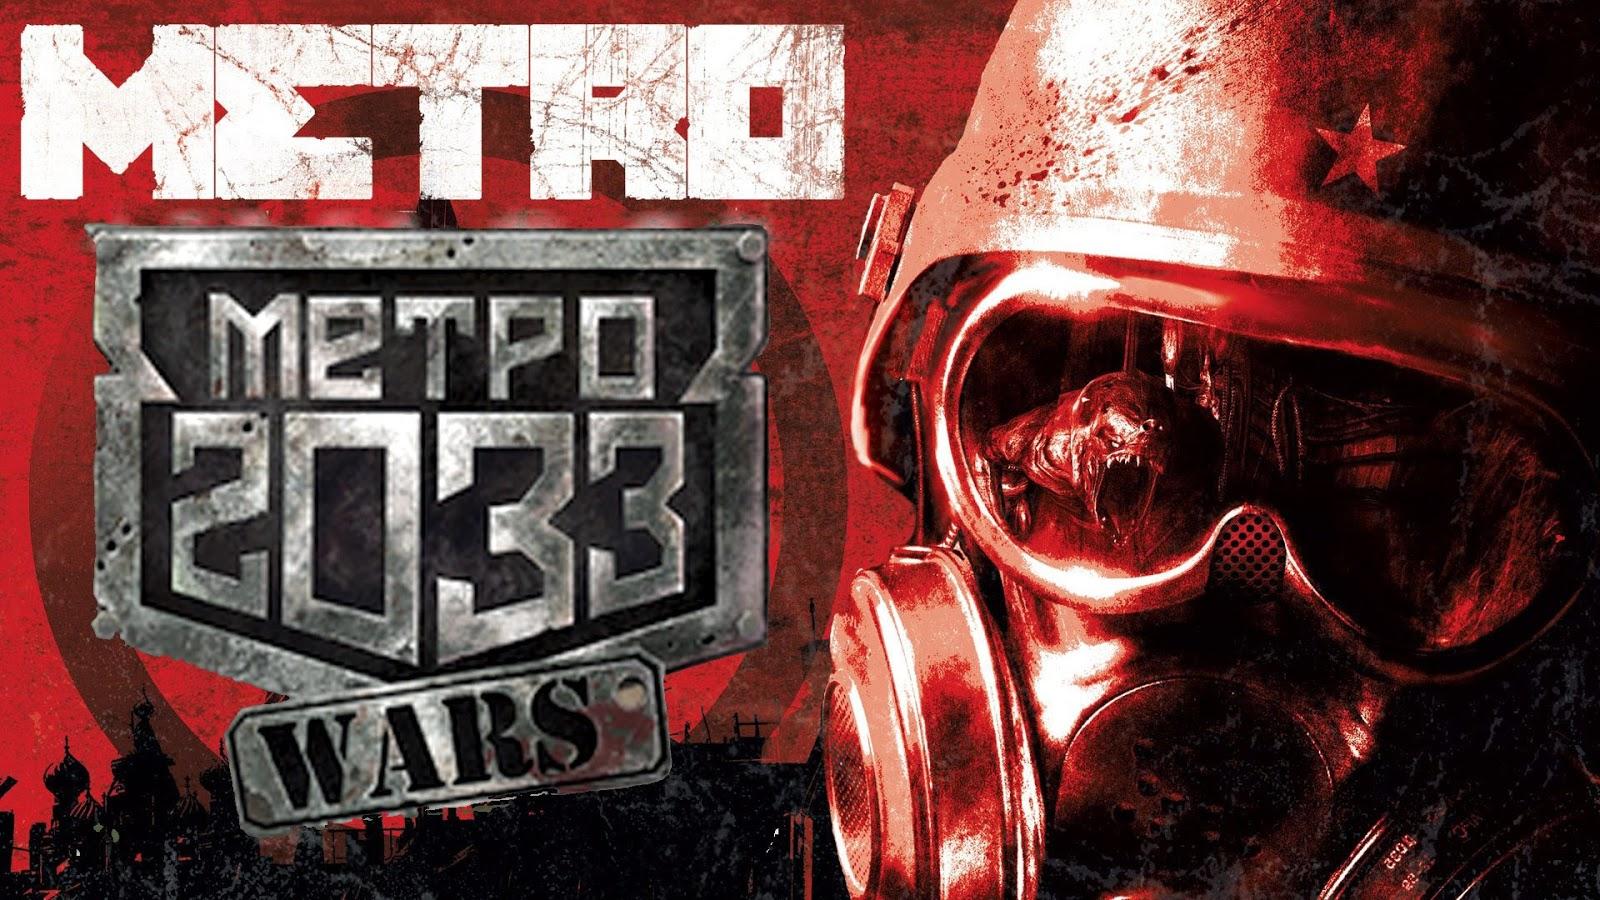 Metro 2033 Wars v1.51 [Link Direto]